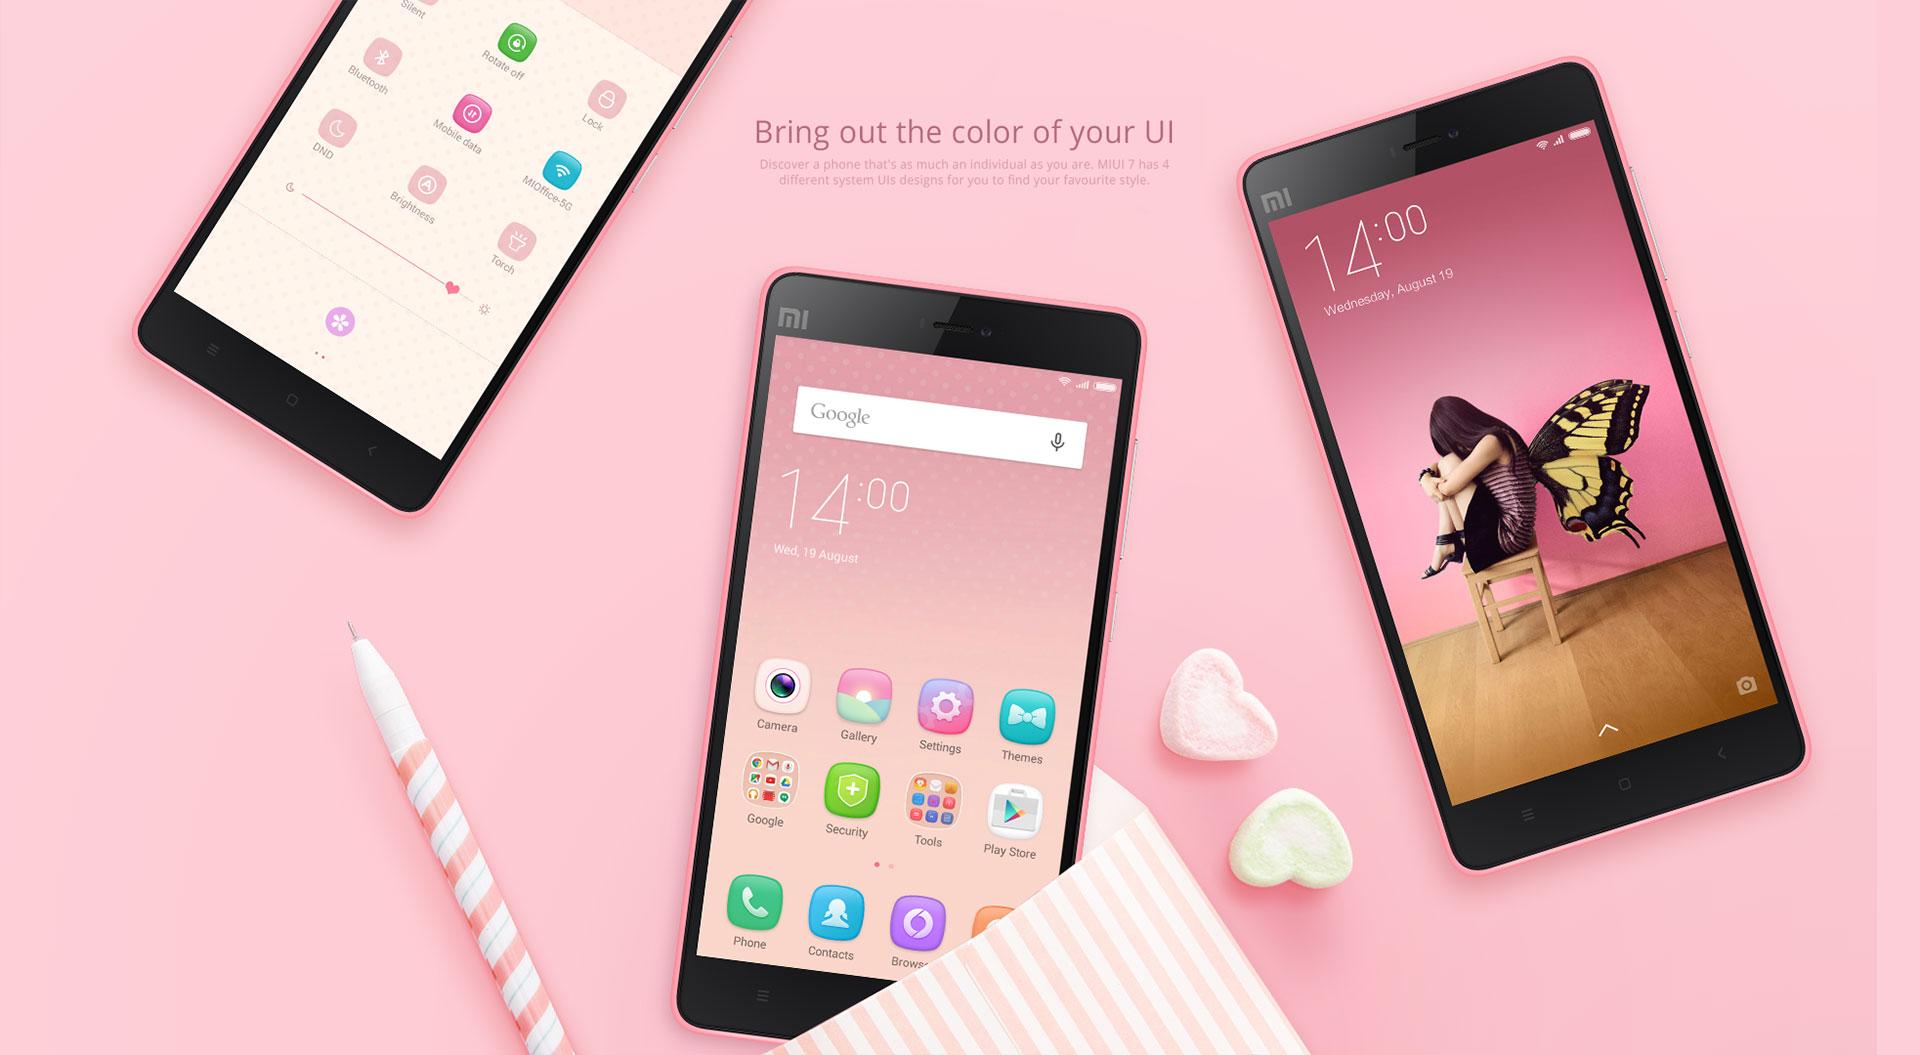 Xiaomi MIUI 7 OTA rollout starting October 27 - NotebookCheck net News